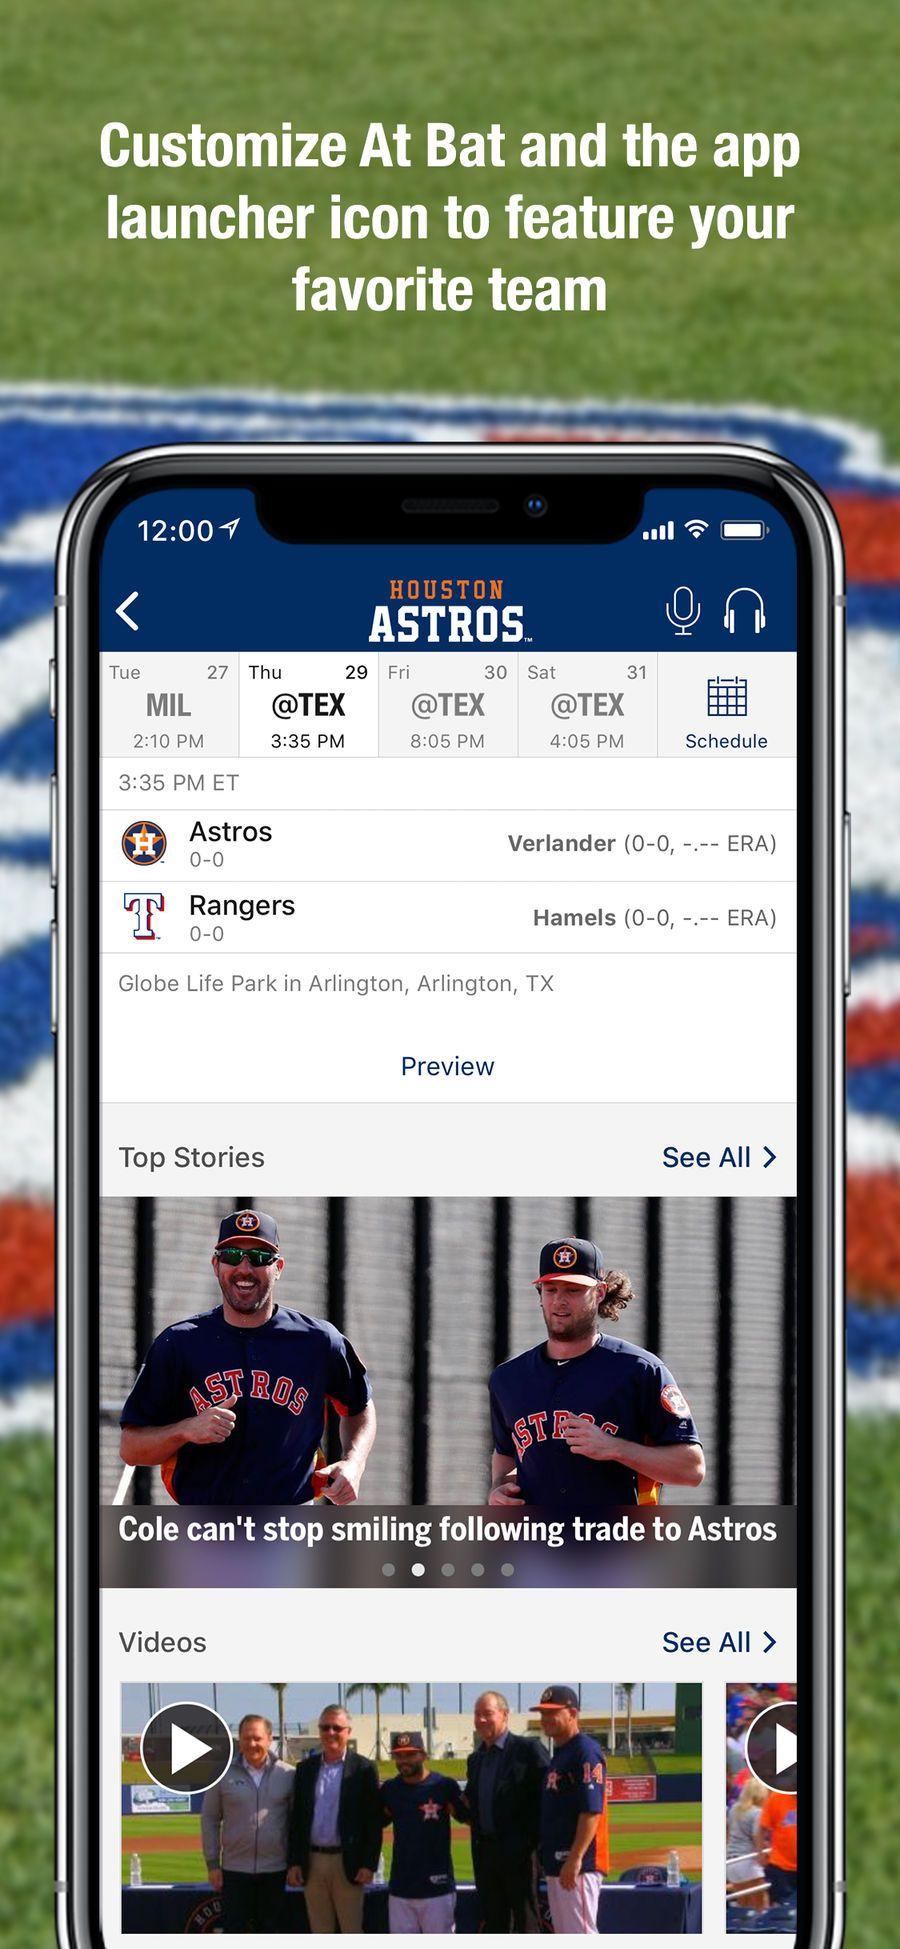 Mlb At Bat Ios Apps App Entertainment Mlb Favorite Team App